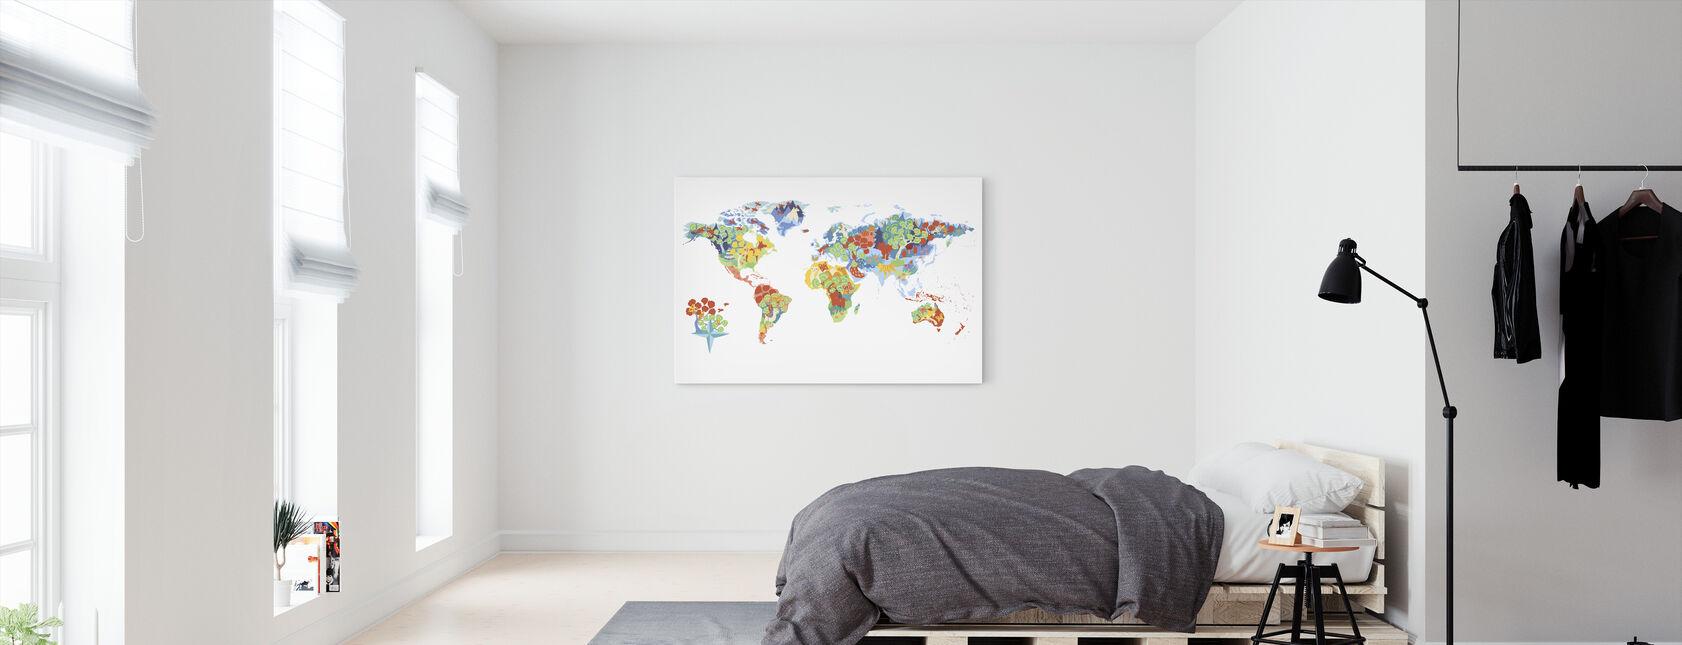 Wonderful World - Canvas print - Bedroom